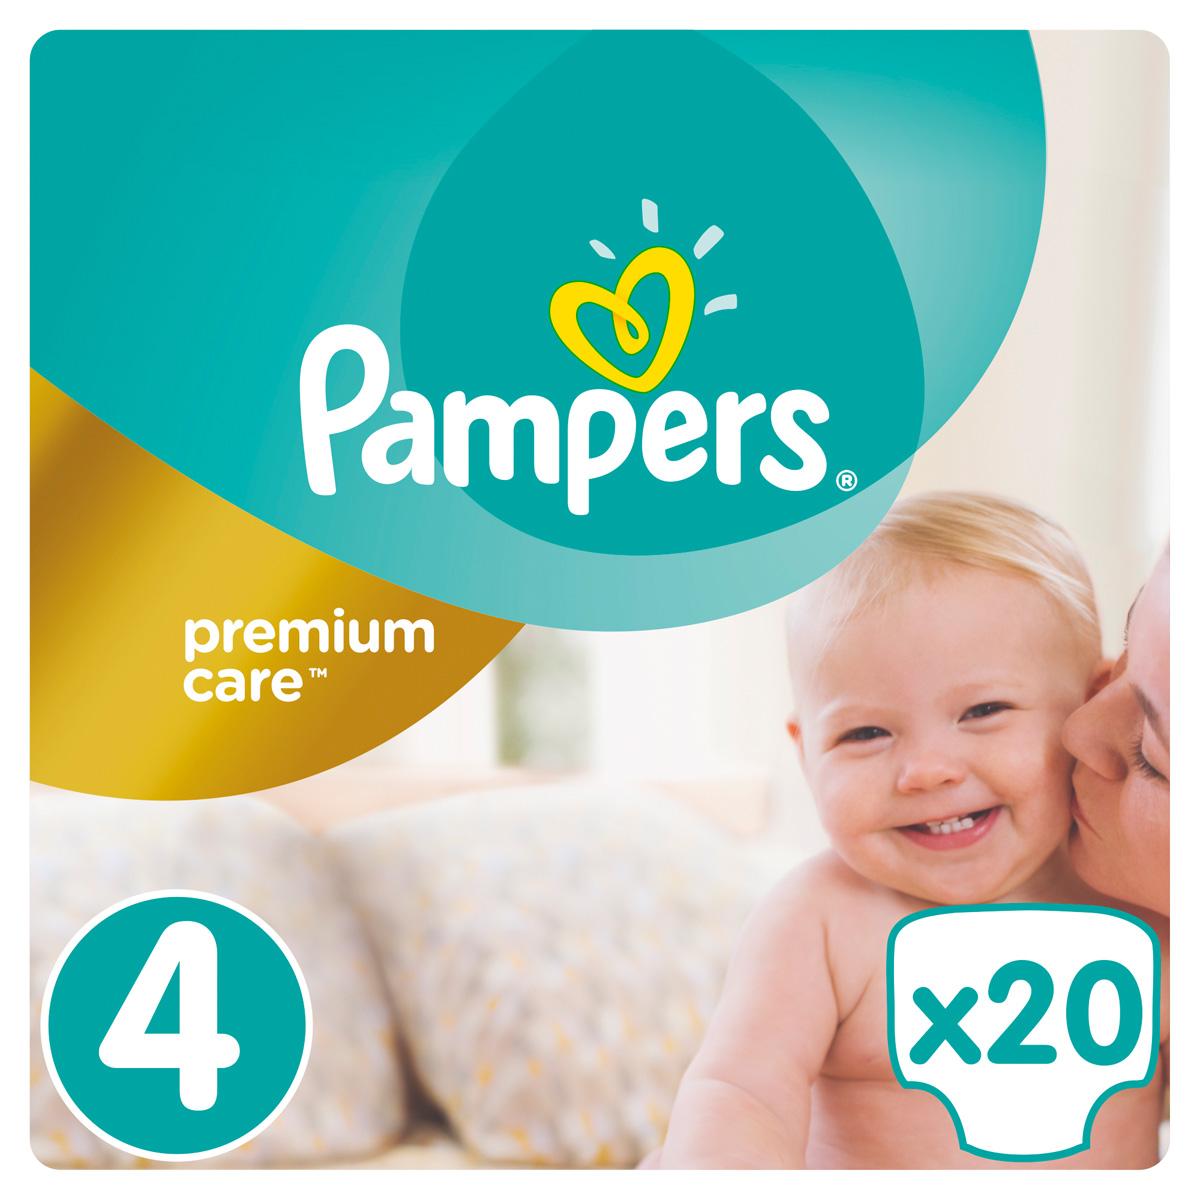 Pampers Подгузники Premium Care 8-14 кг (размер 4) 20 шт подгузники детские pampers подгузники pampers premium care 3 6 кг 96 шт